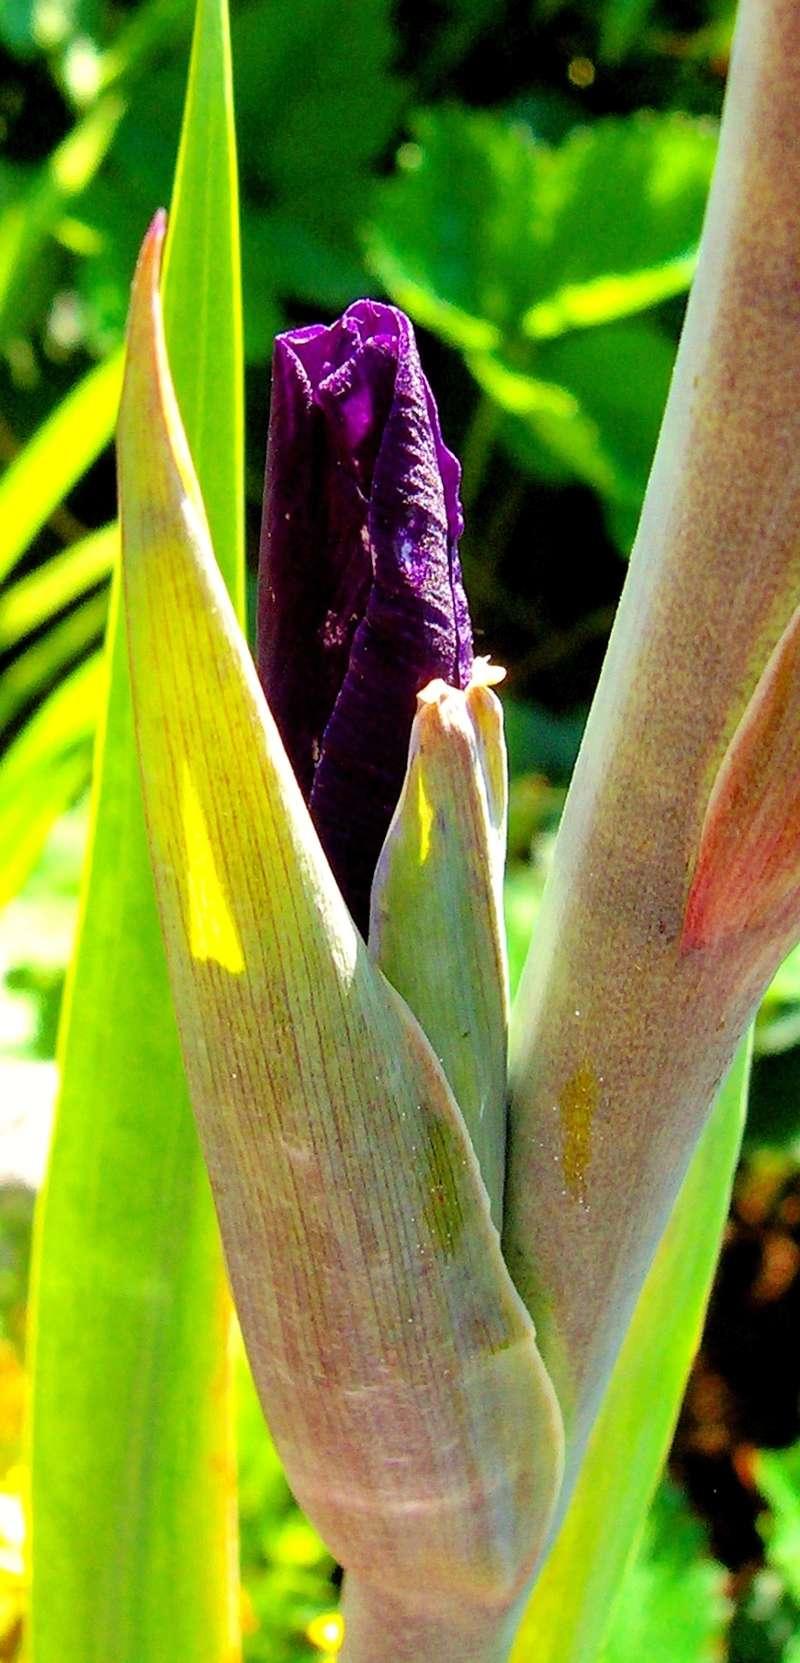 Schwertliliengewächse: Iris, Tigrida, Ixia, Sparaxis, Crocus, Freesia, Montbretie u.v.m. - Seite 16 Iris_b10